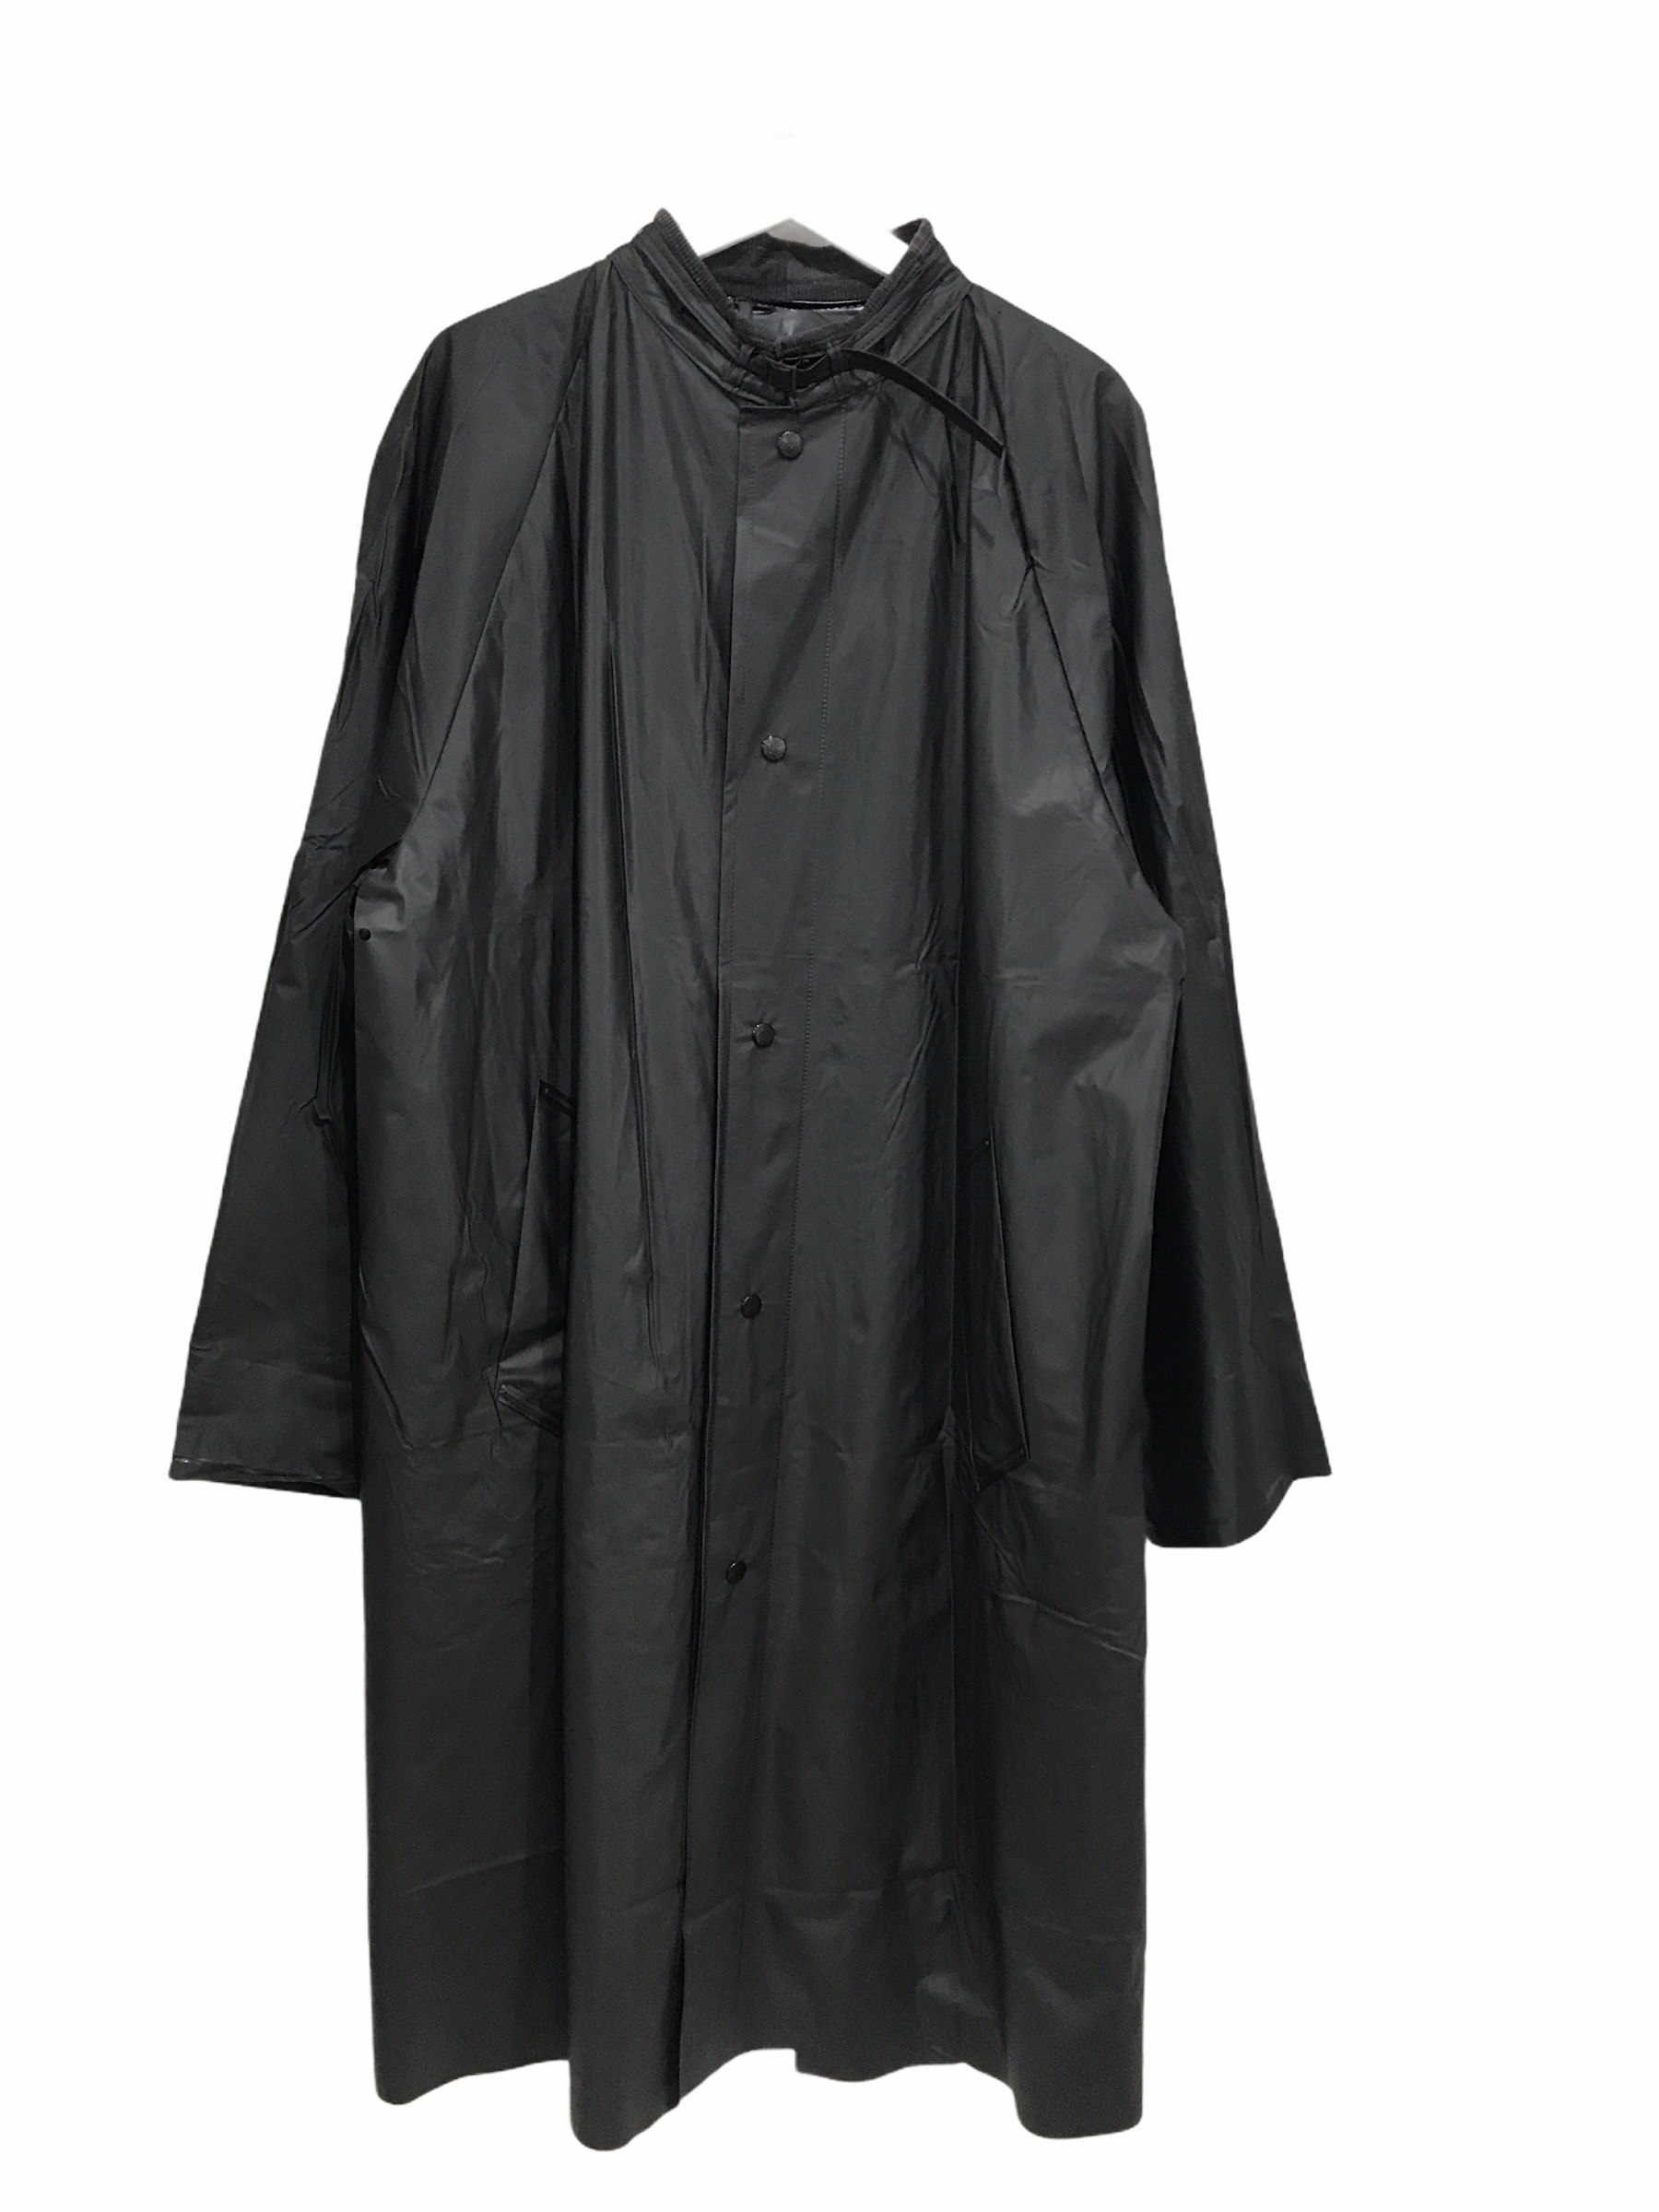 Dead Stock Swedish Army Black Rain Coat 50